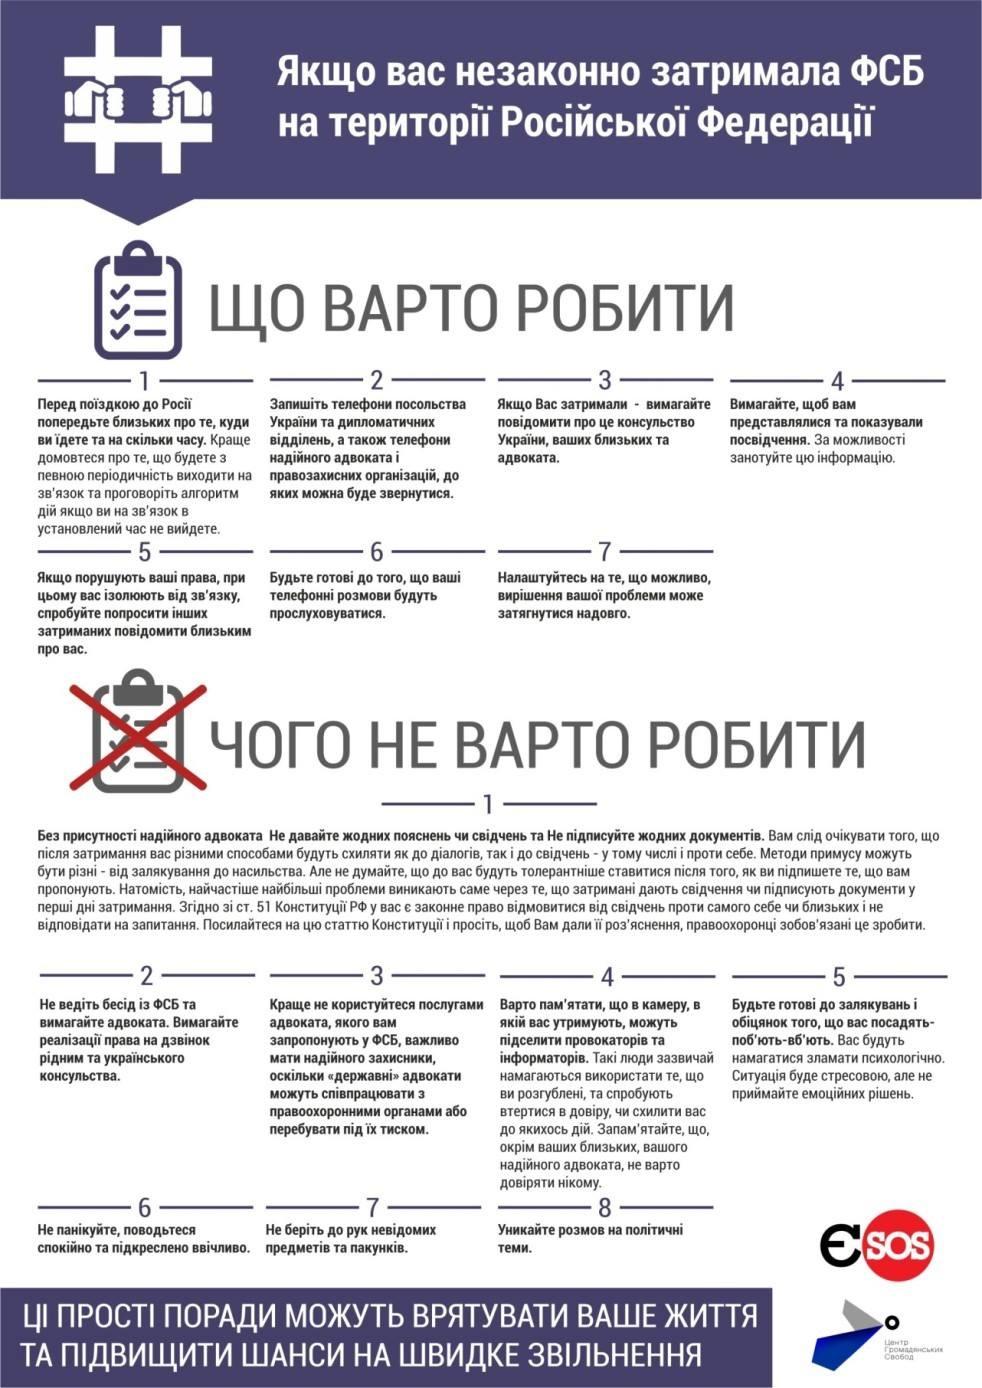 https//glavcom.ua/img/forall/users/84/85/.jpg_382.jpg